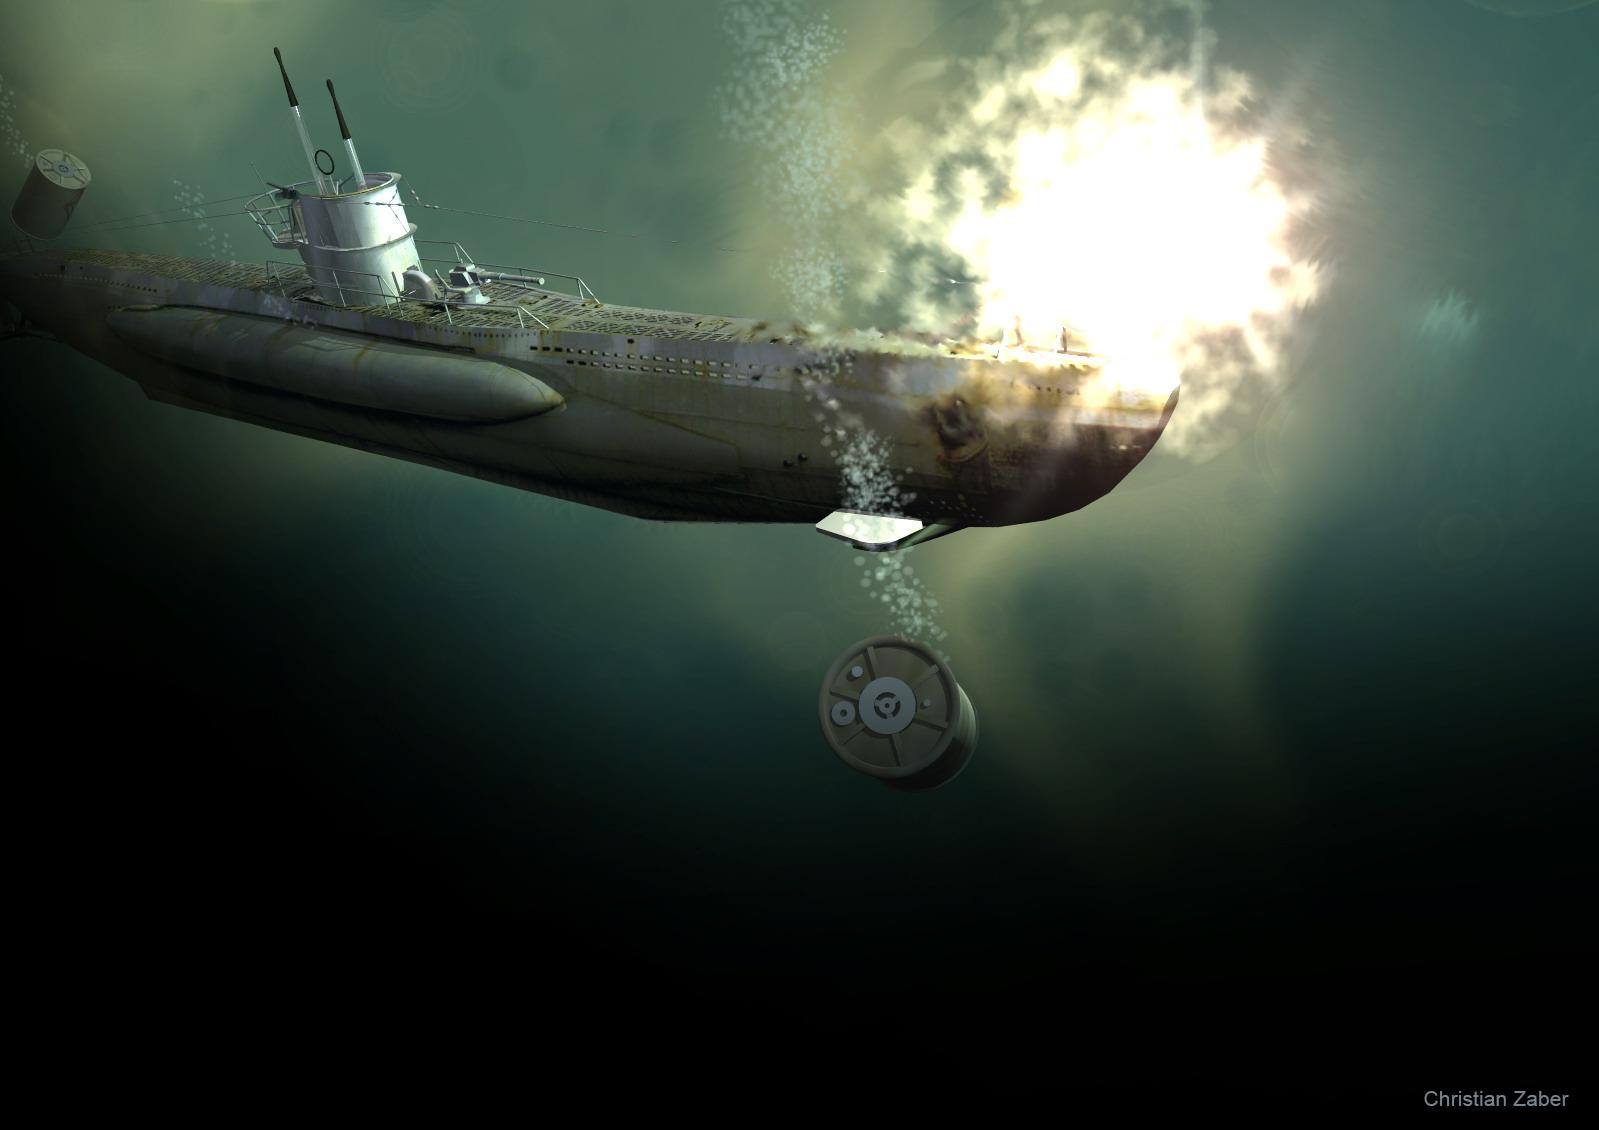 Military   Submarine Wallpaper 1599x1130